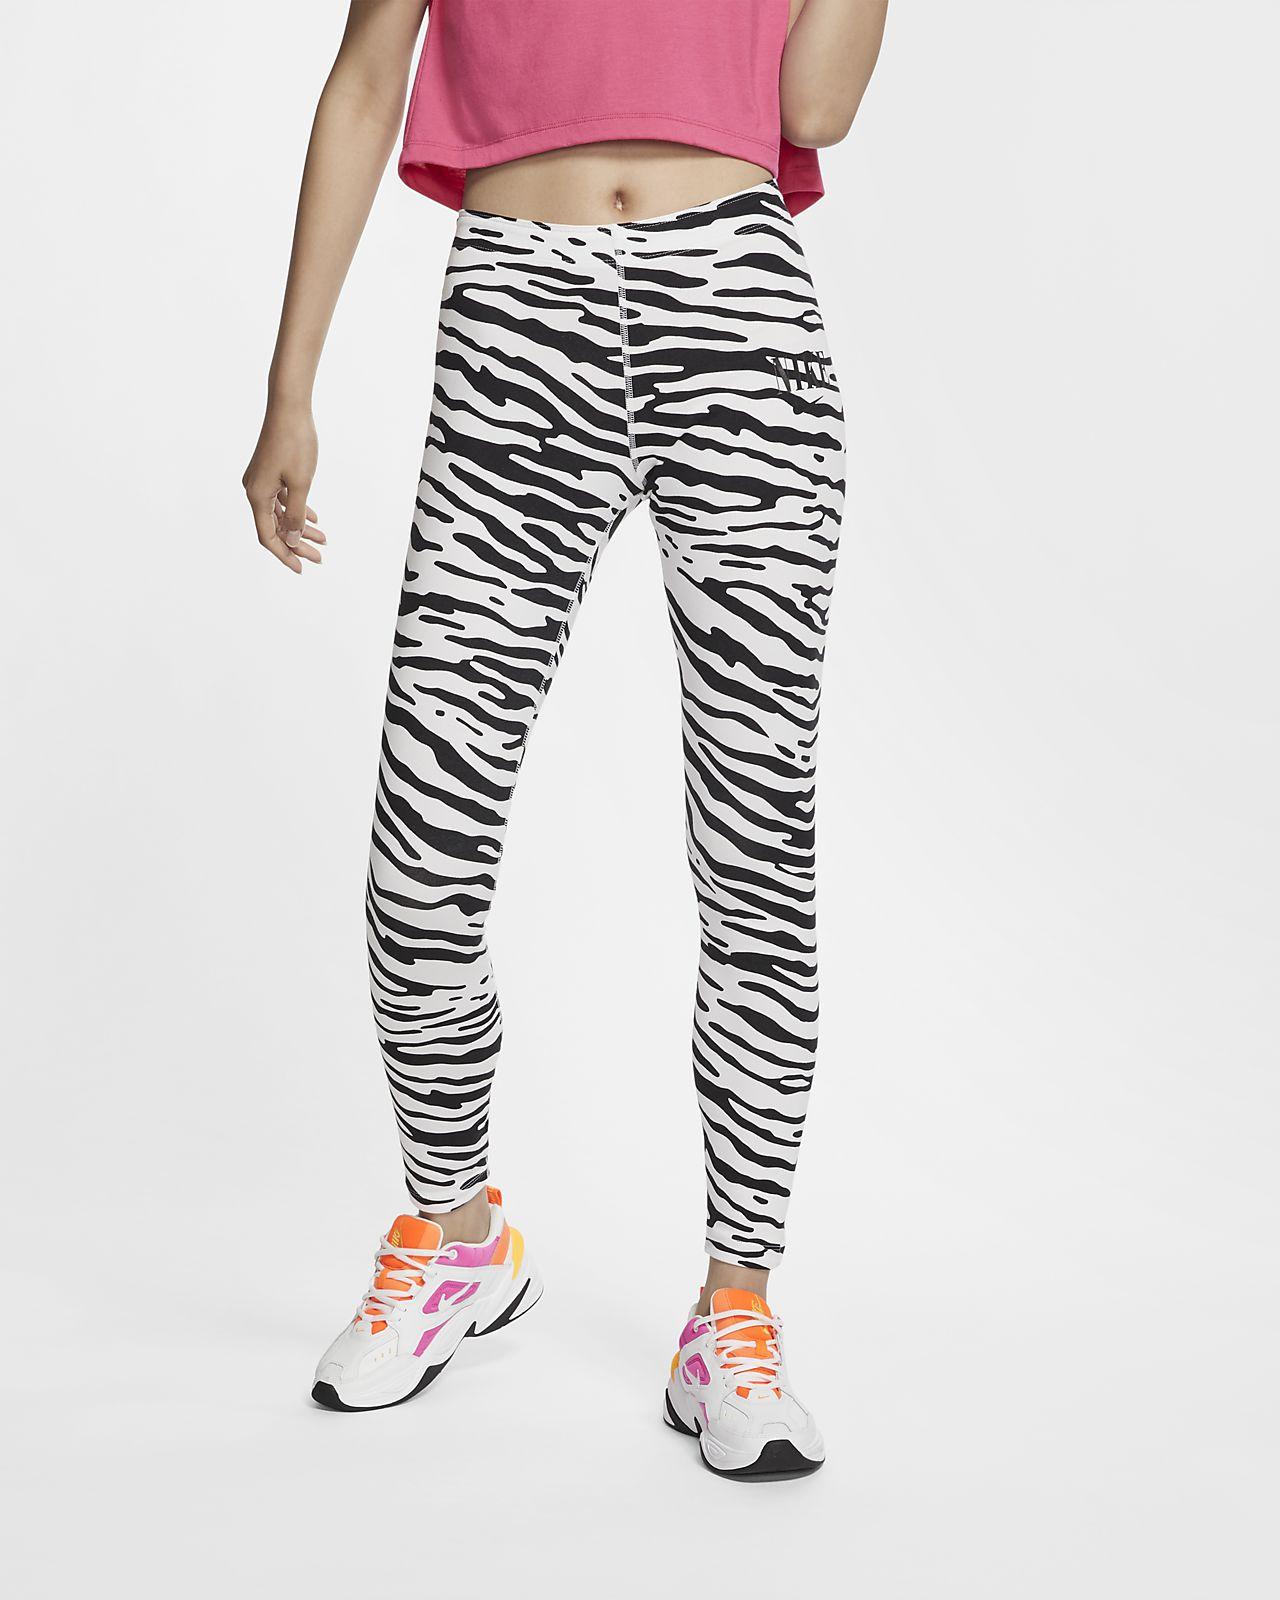 Nike Sportswear Essential-leggings med print til kvinder